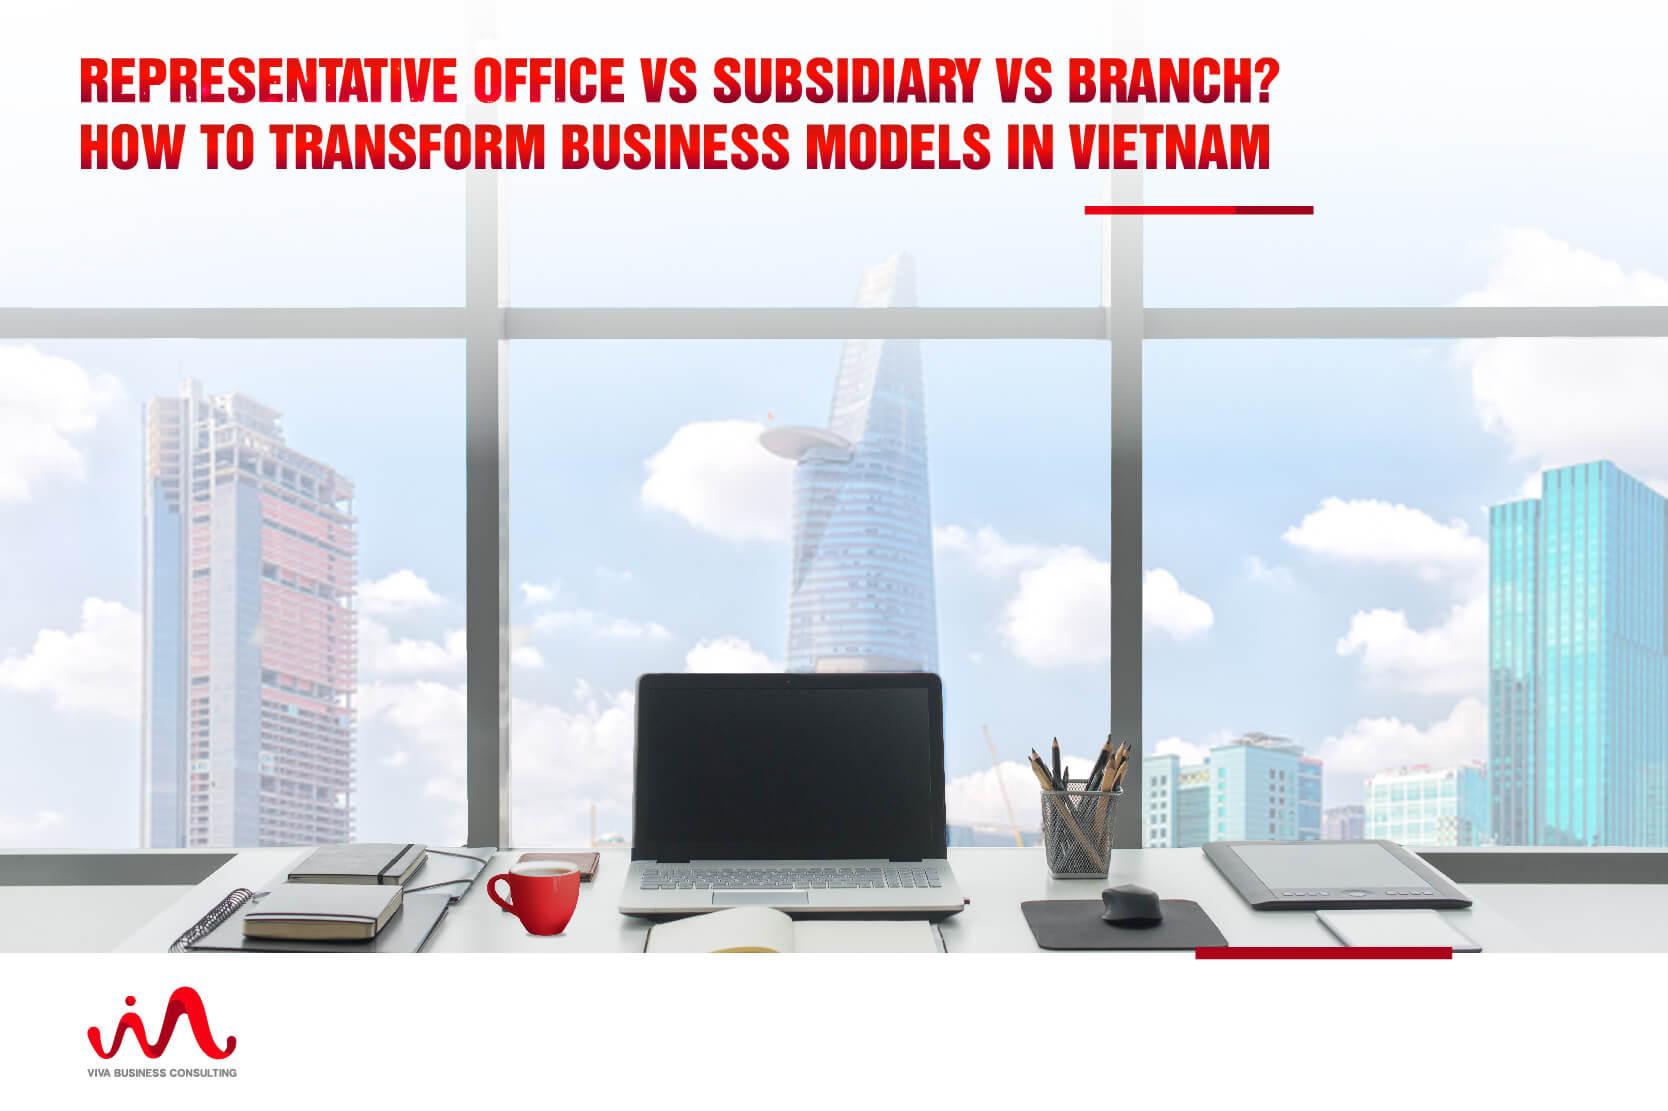 Representative Office vs Subsidiary vs Branch? How to transform business models in Vietnam